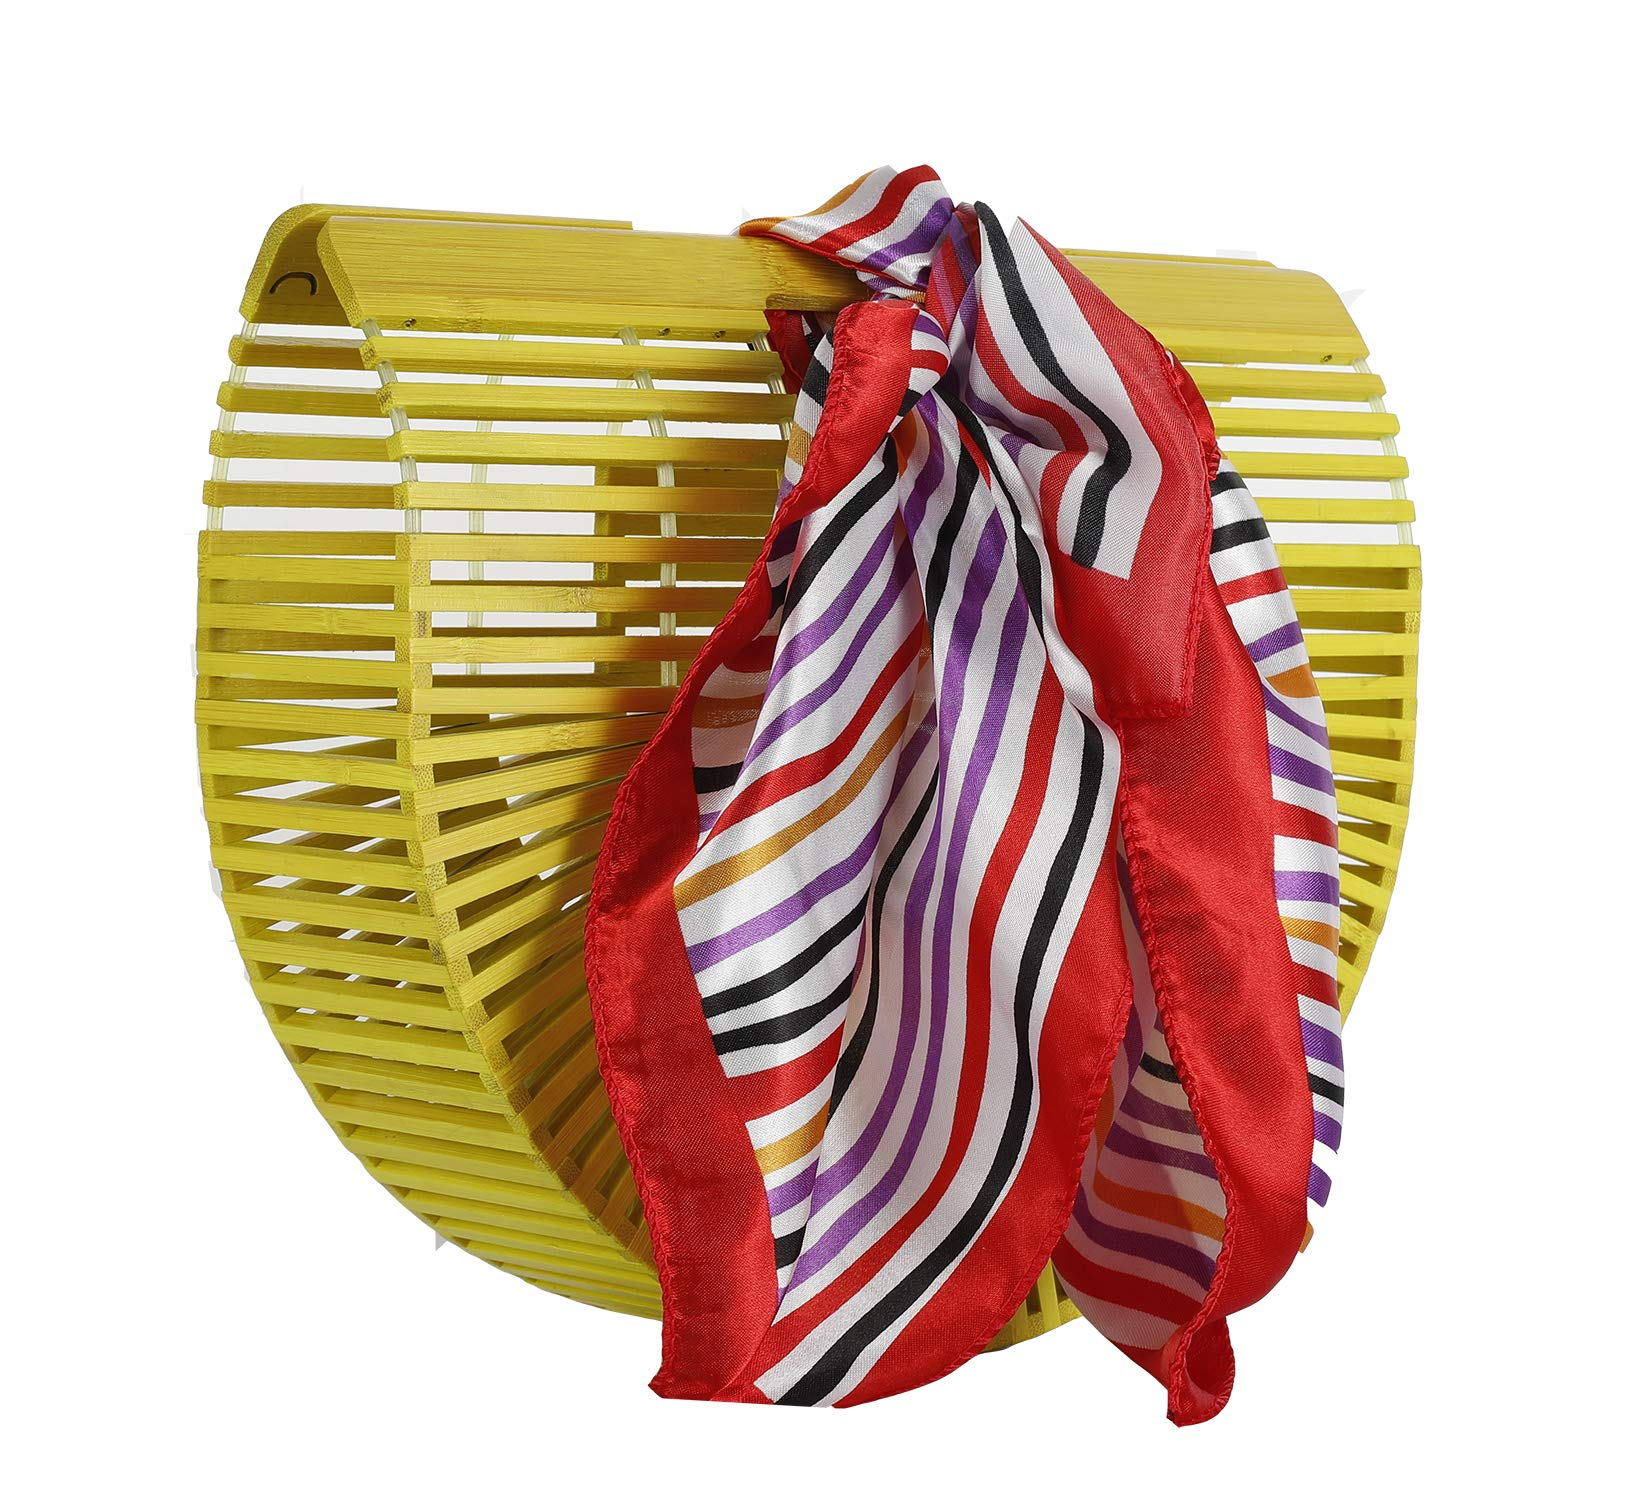 Bamboo Clutch Ark Bag Beach Handbag (bamboo yellow)